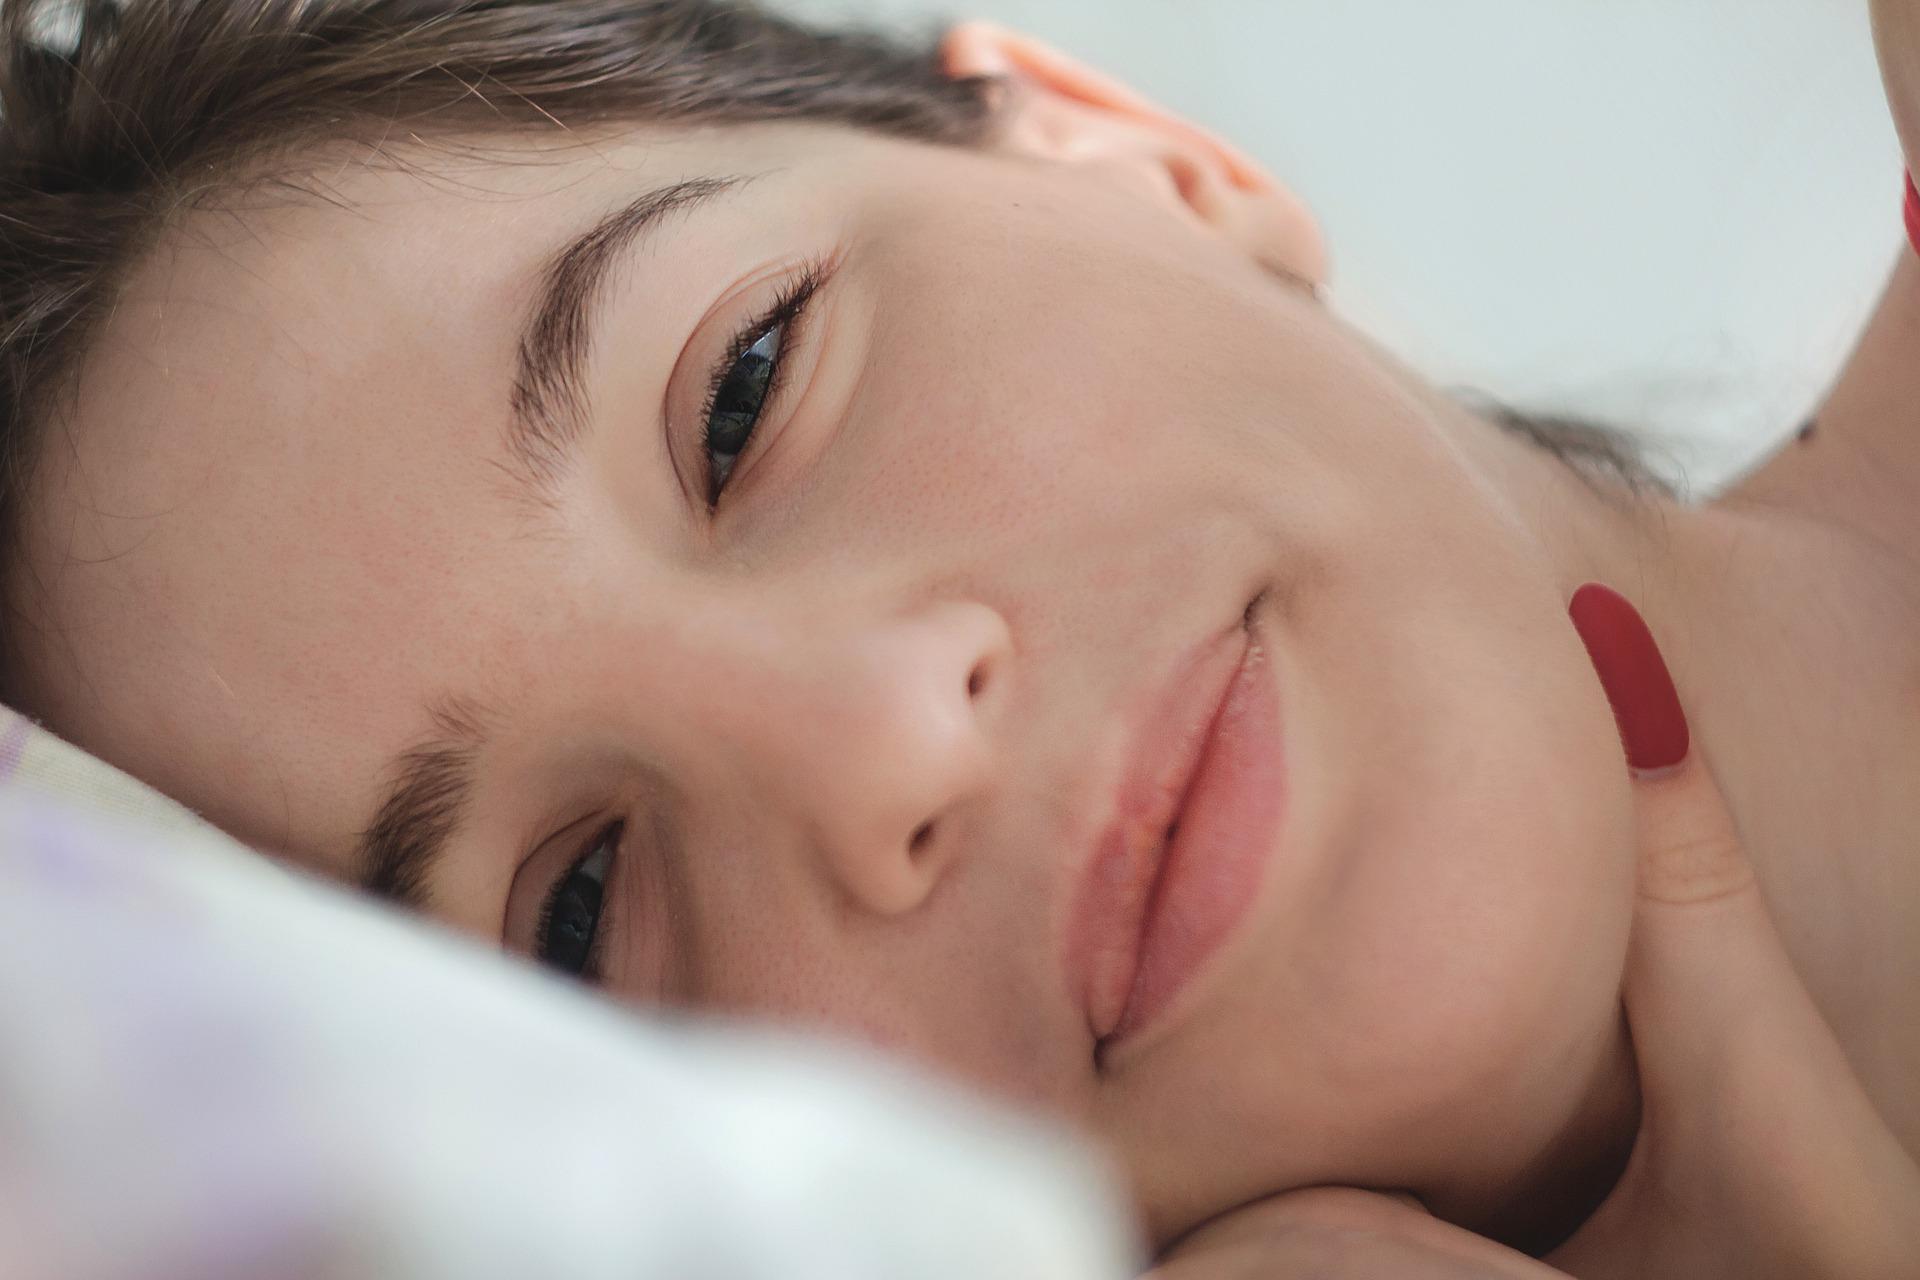 Woman in bed.jpg